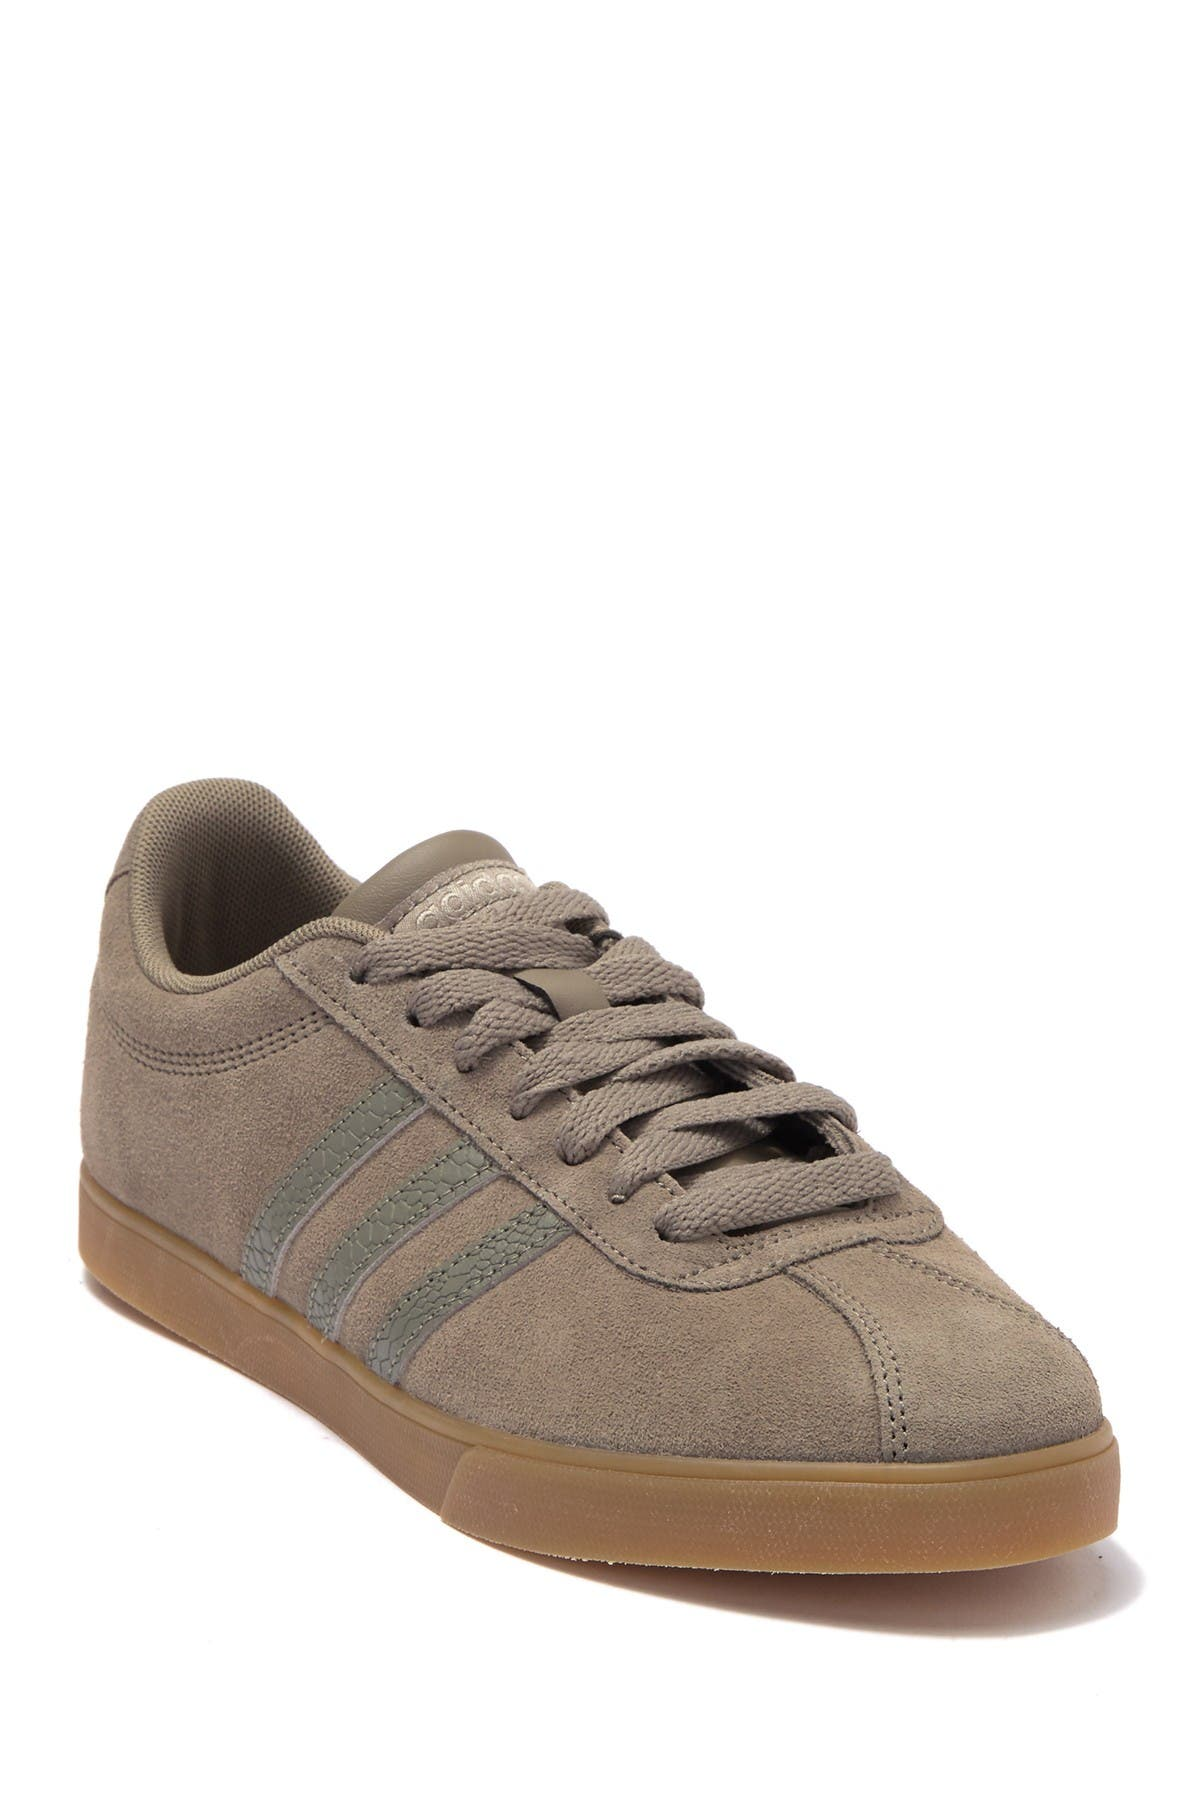 adidas | Courtset Sneaker | Nordstrom Rack